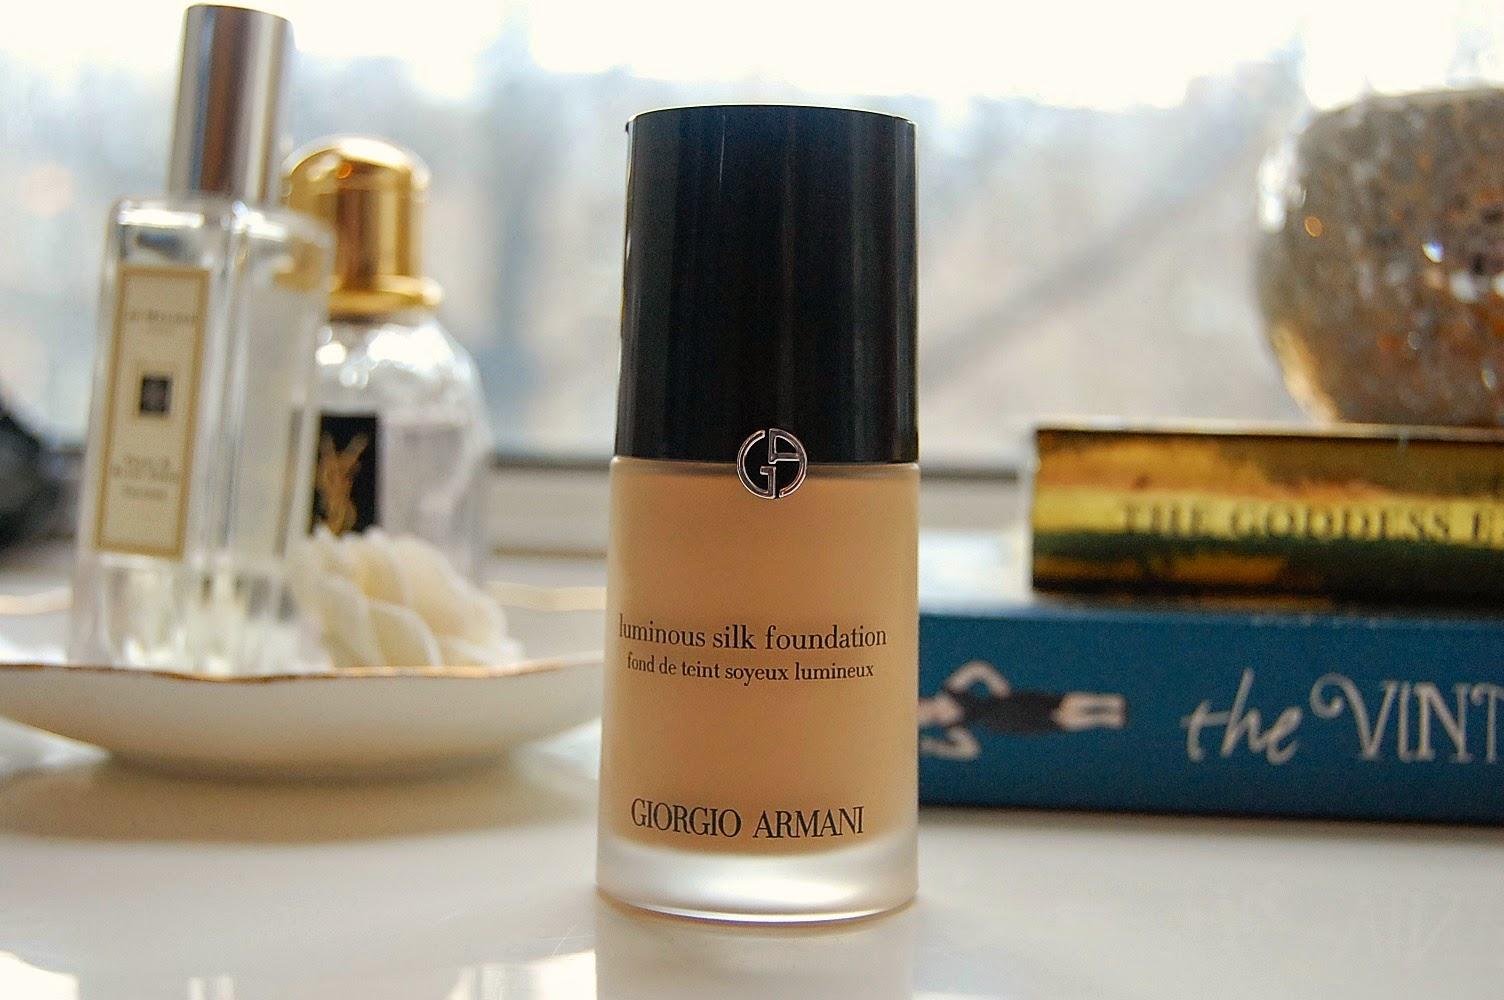 Giorgio Armani Luminous Silk Foundation Review